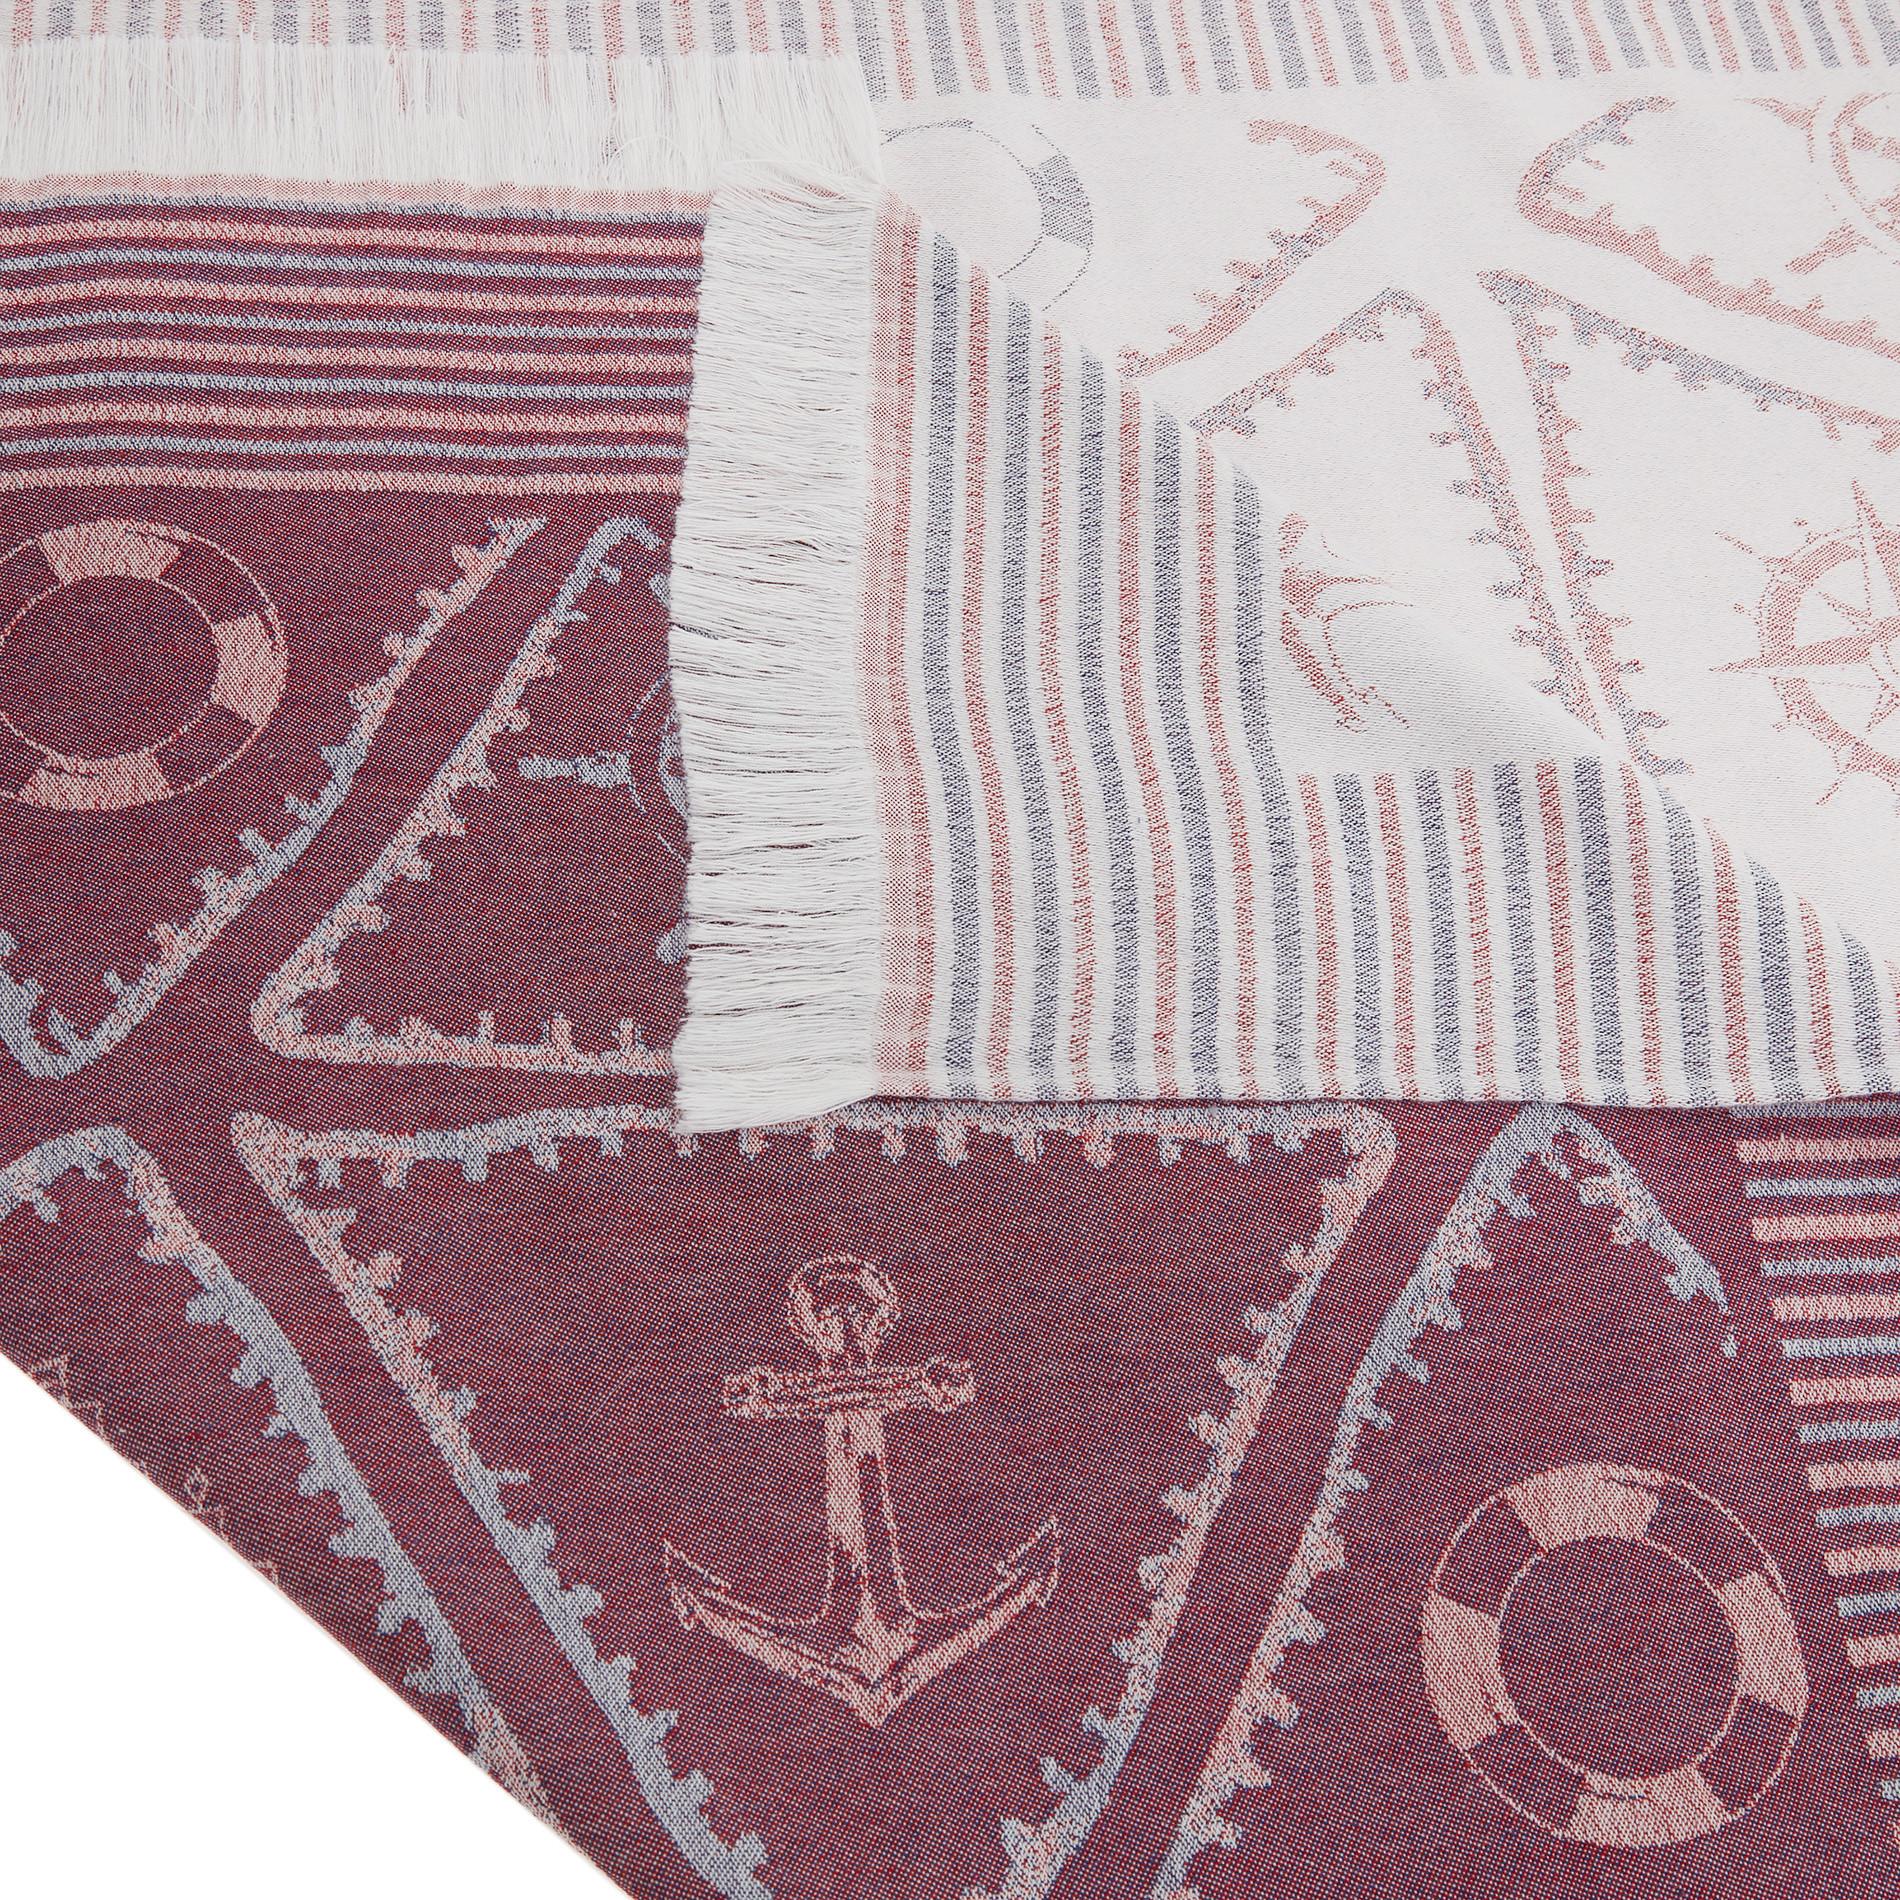 Telo mare cotone leggero motivo triangoli, Bianco, large image number 1